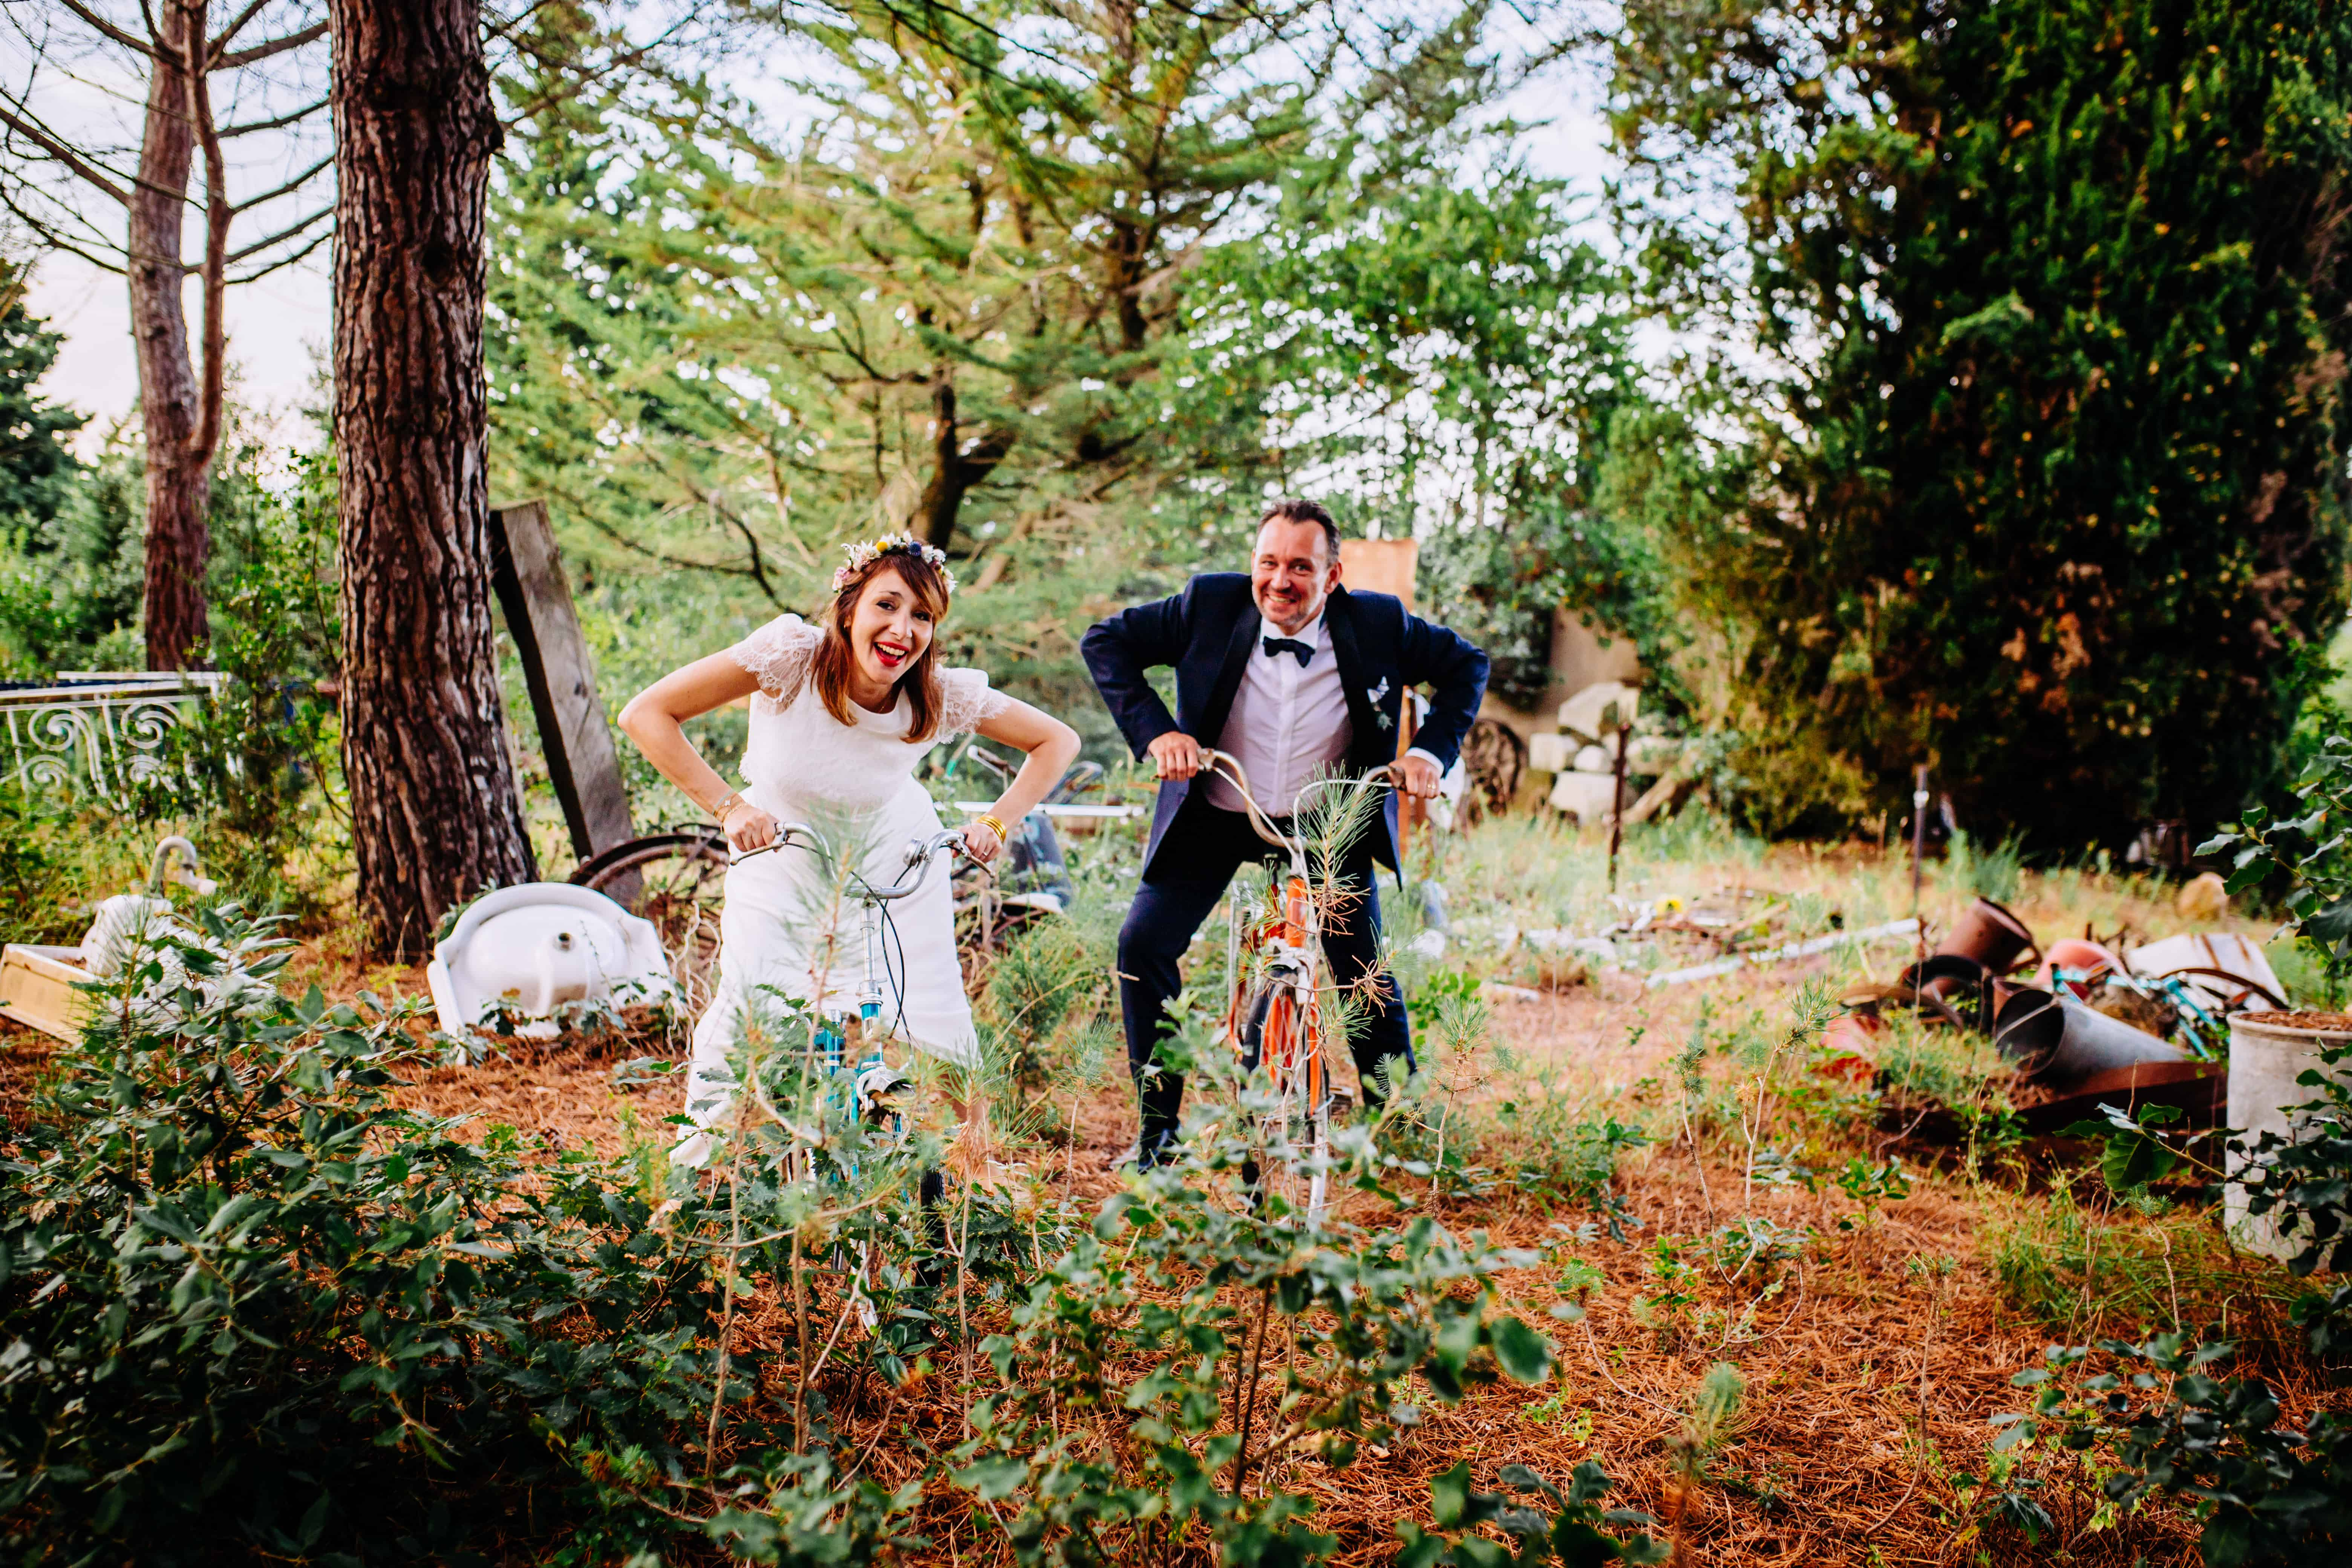 photo-fun-mariage-couple-a-velo-laure-sophie